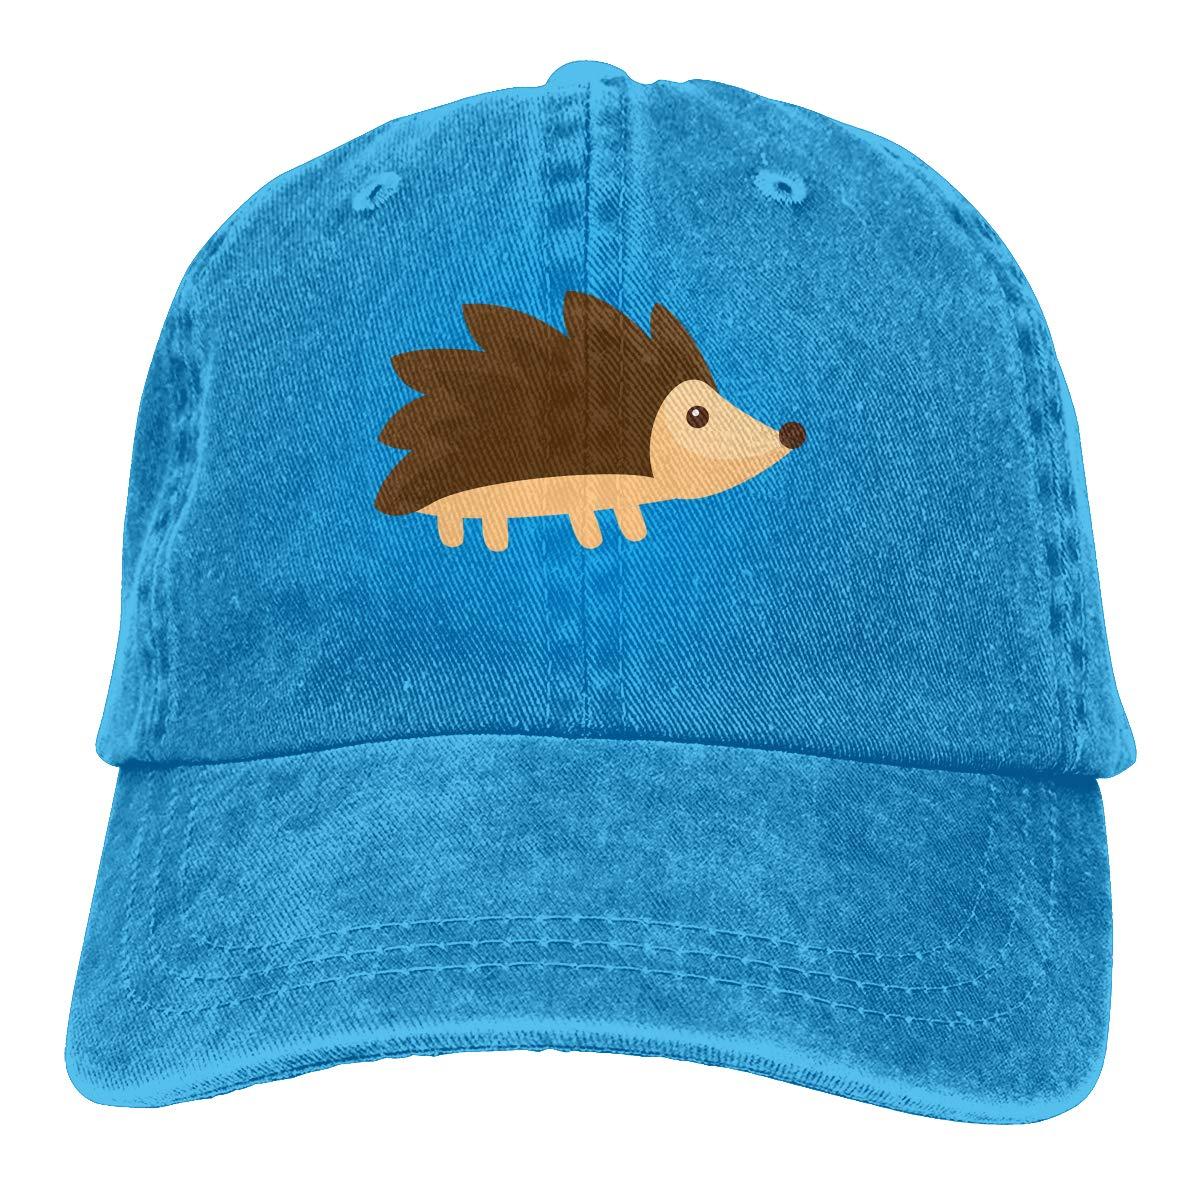 Qbeir Adult Unisex Jeans Cap Adjustable Hat Hedgehog Cotton Denim